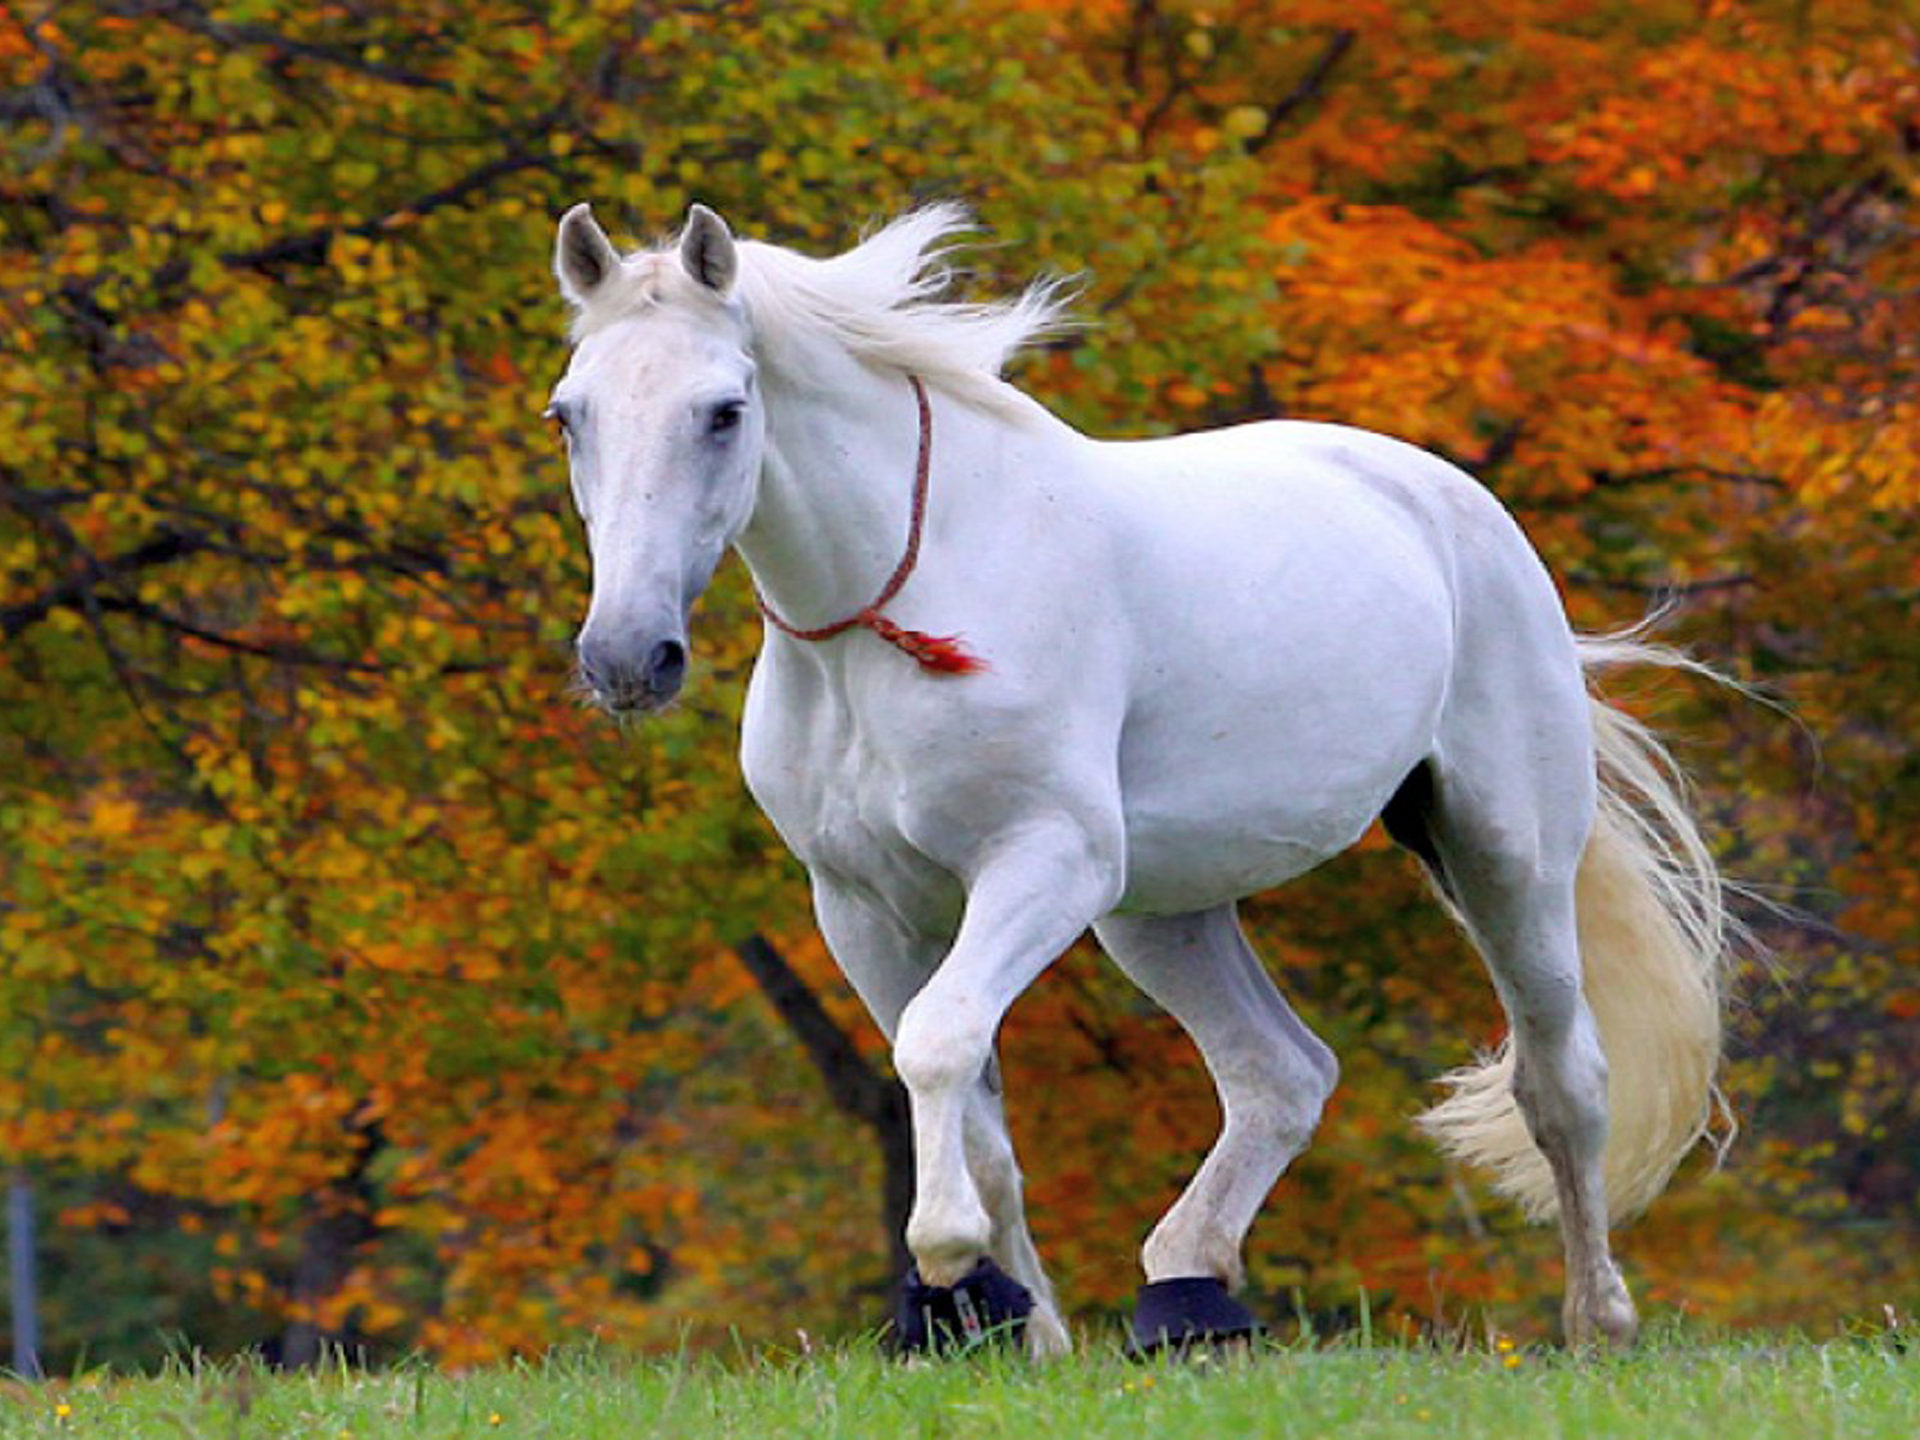 Beautiful White Horse Wallpaper Hd 013